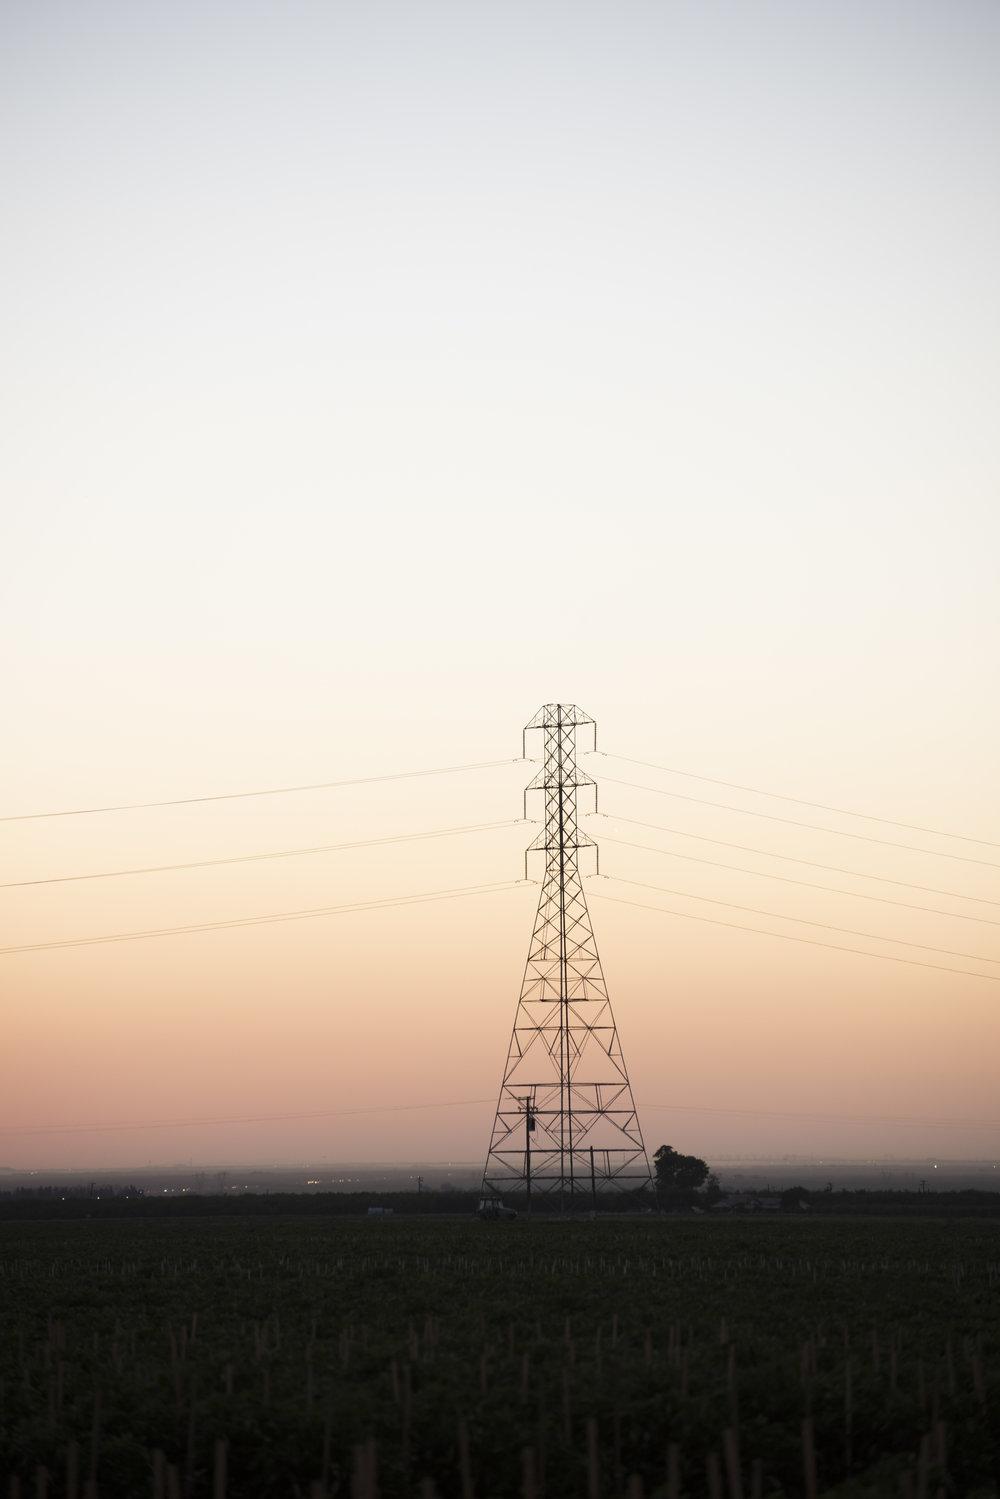 Bolthouse_Sunset-6648.jpg